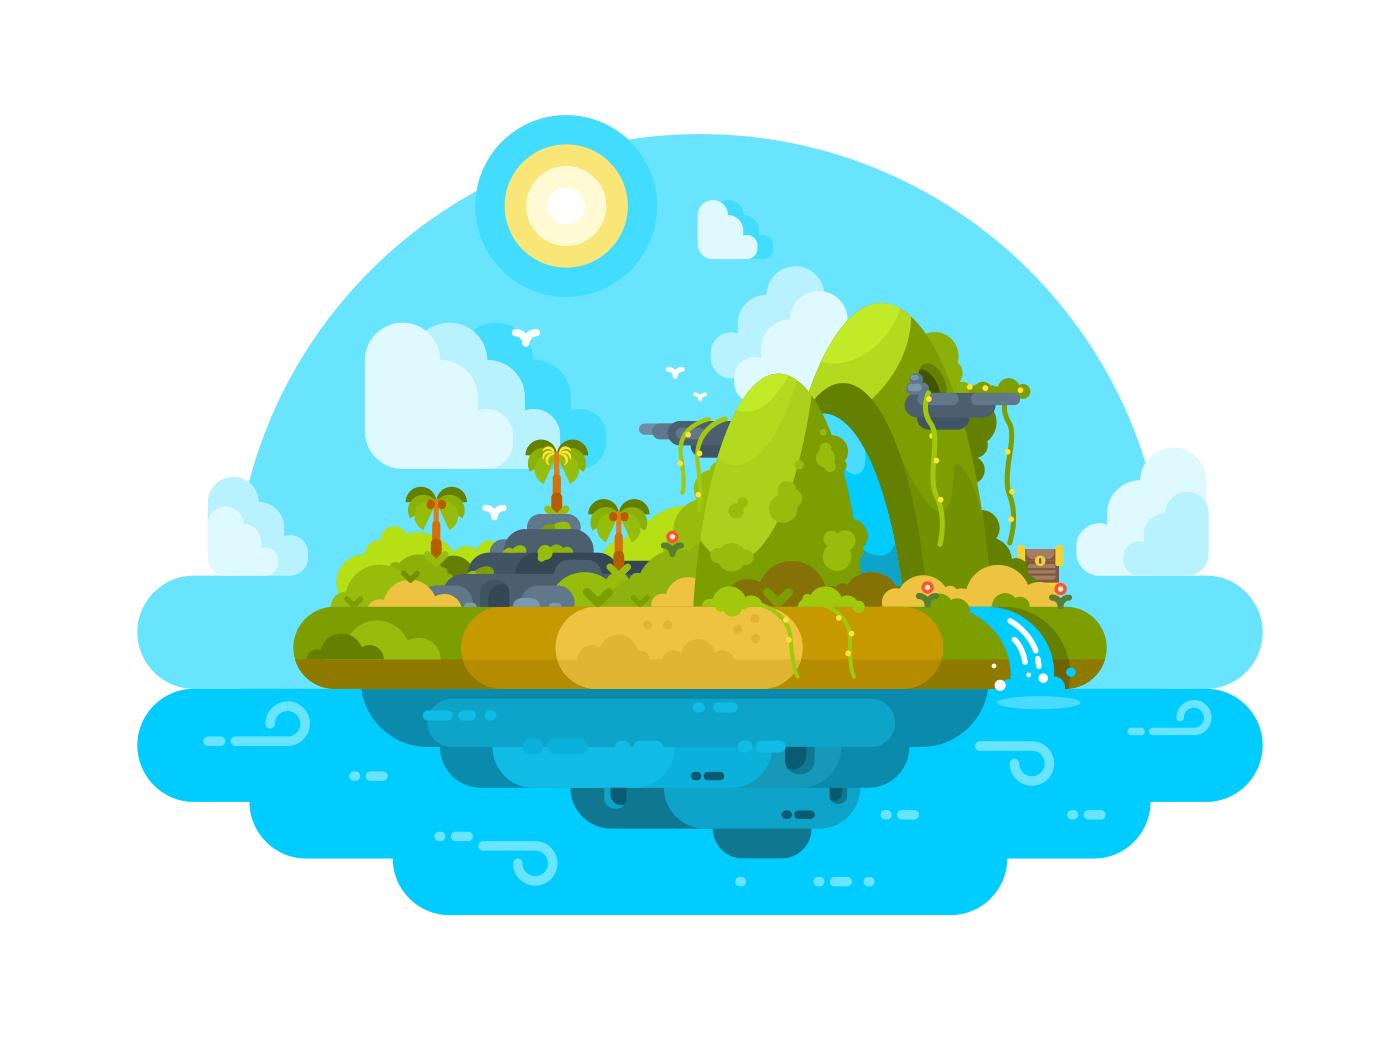 Uninhabited island in ocean illustration